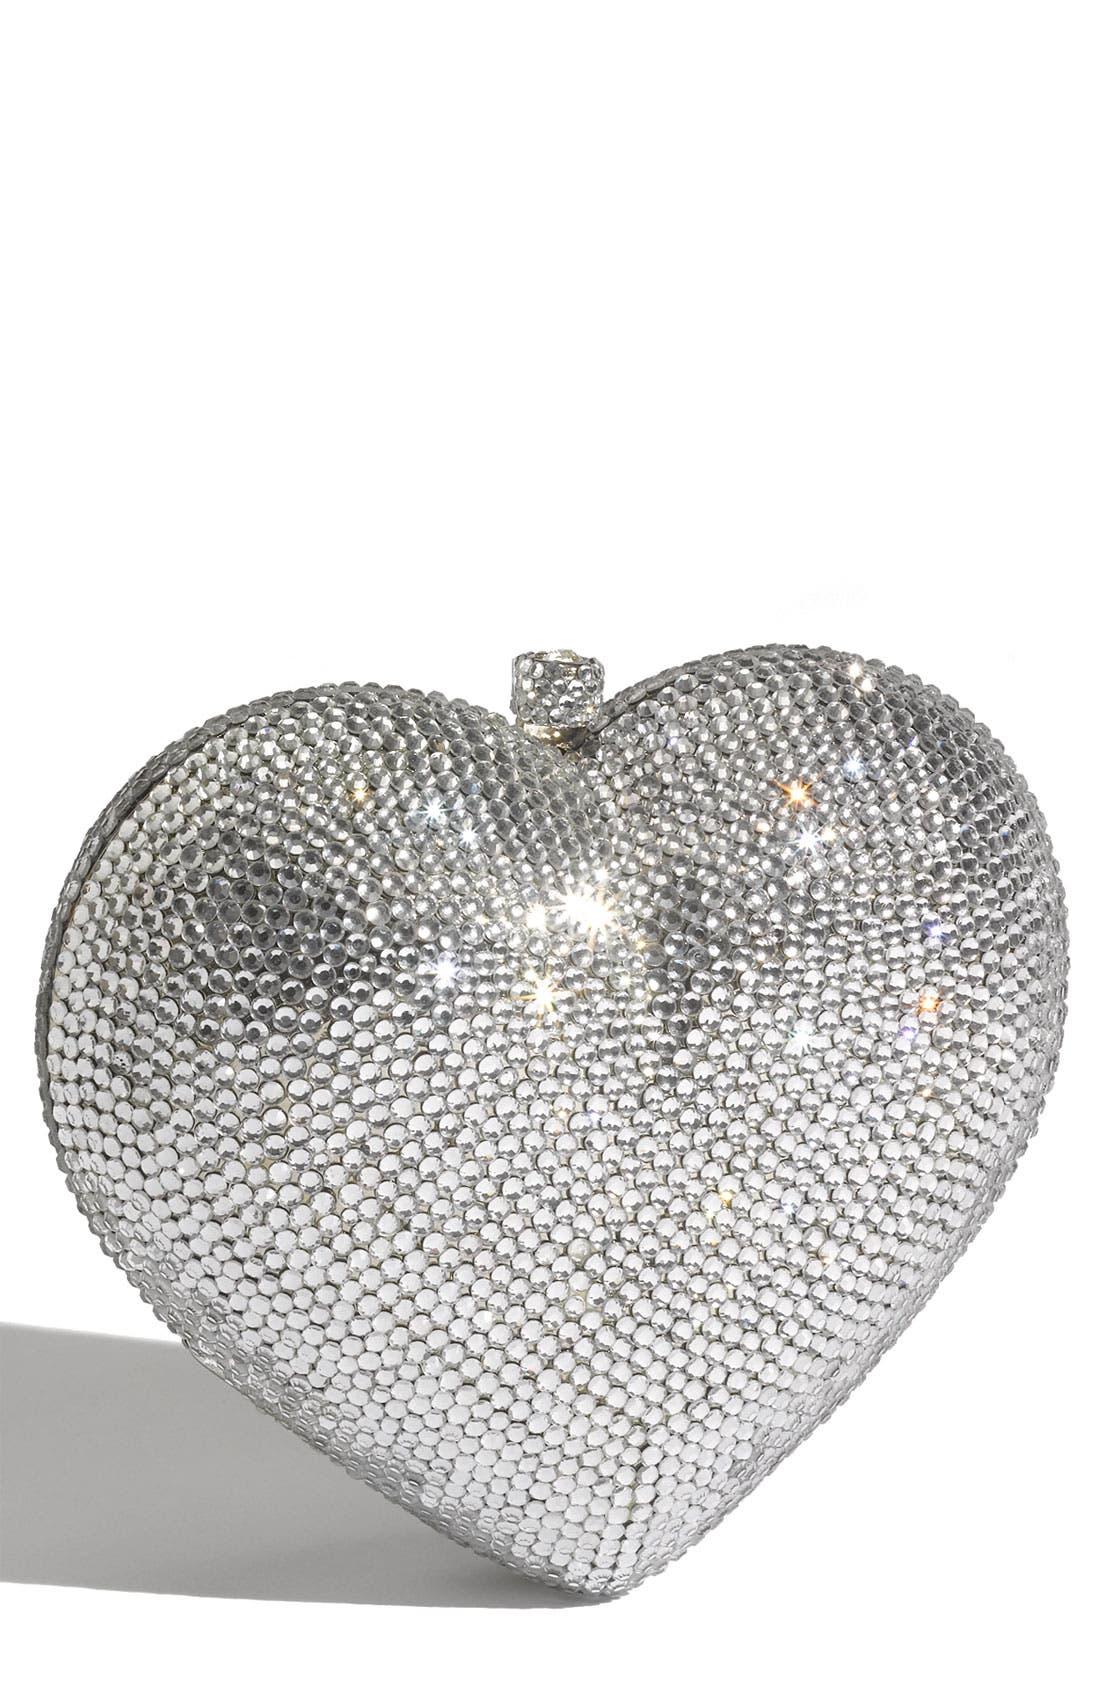 Main Image - Tasha 'Heart' Clutch